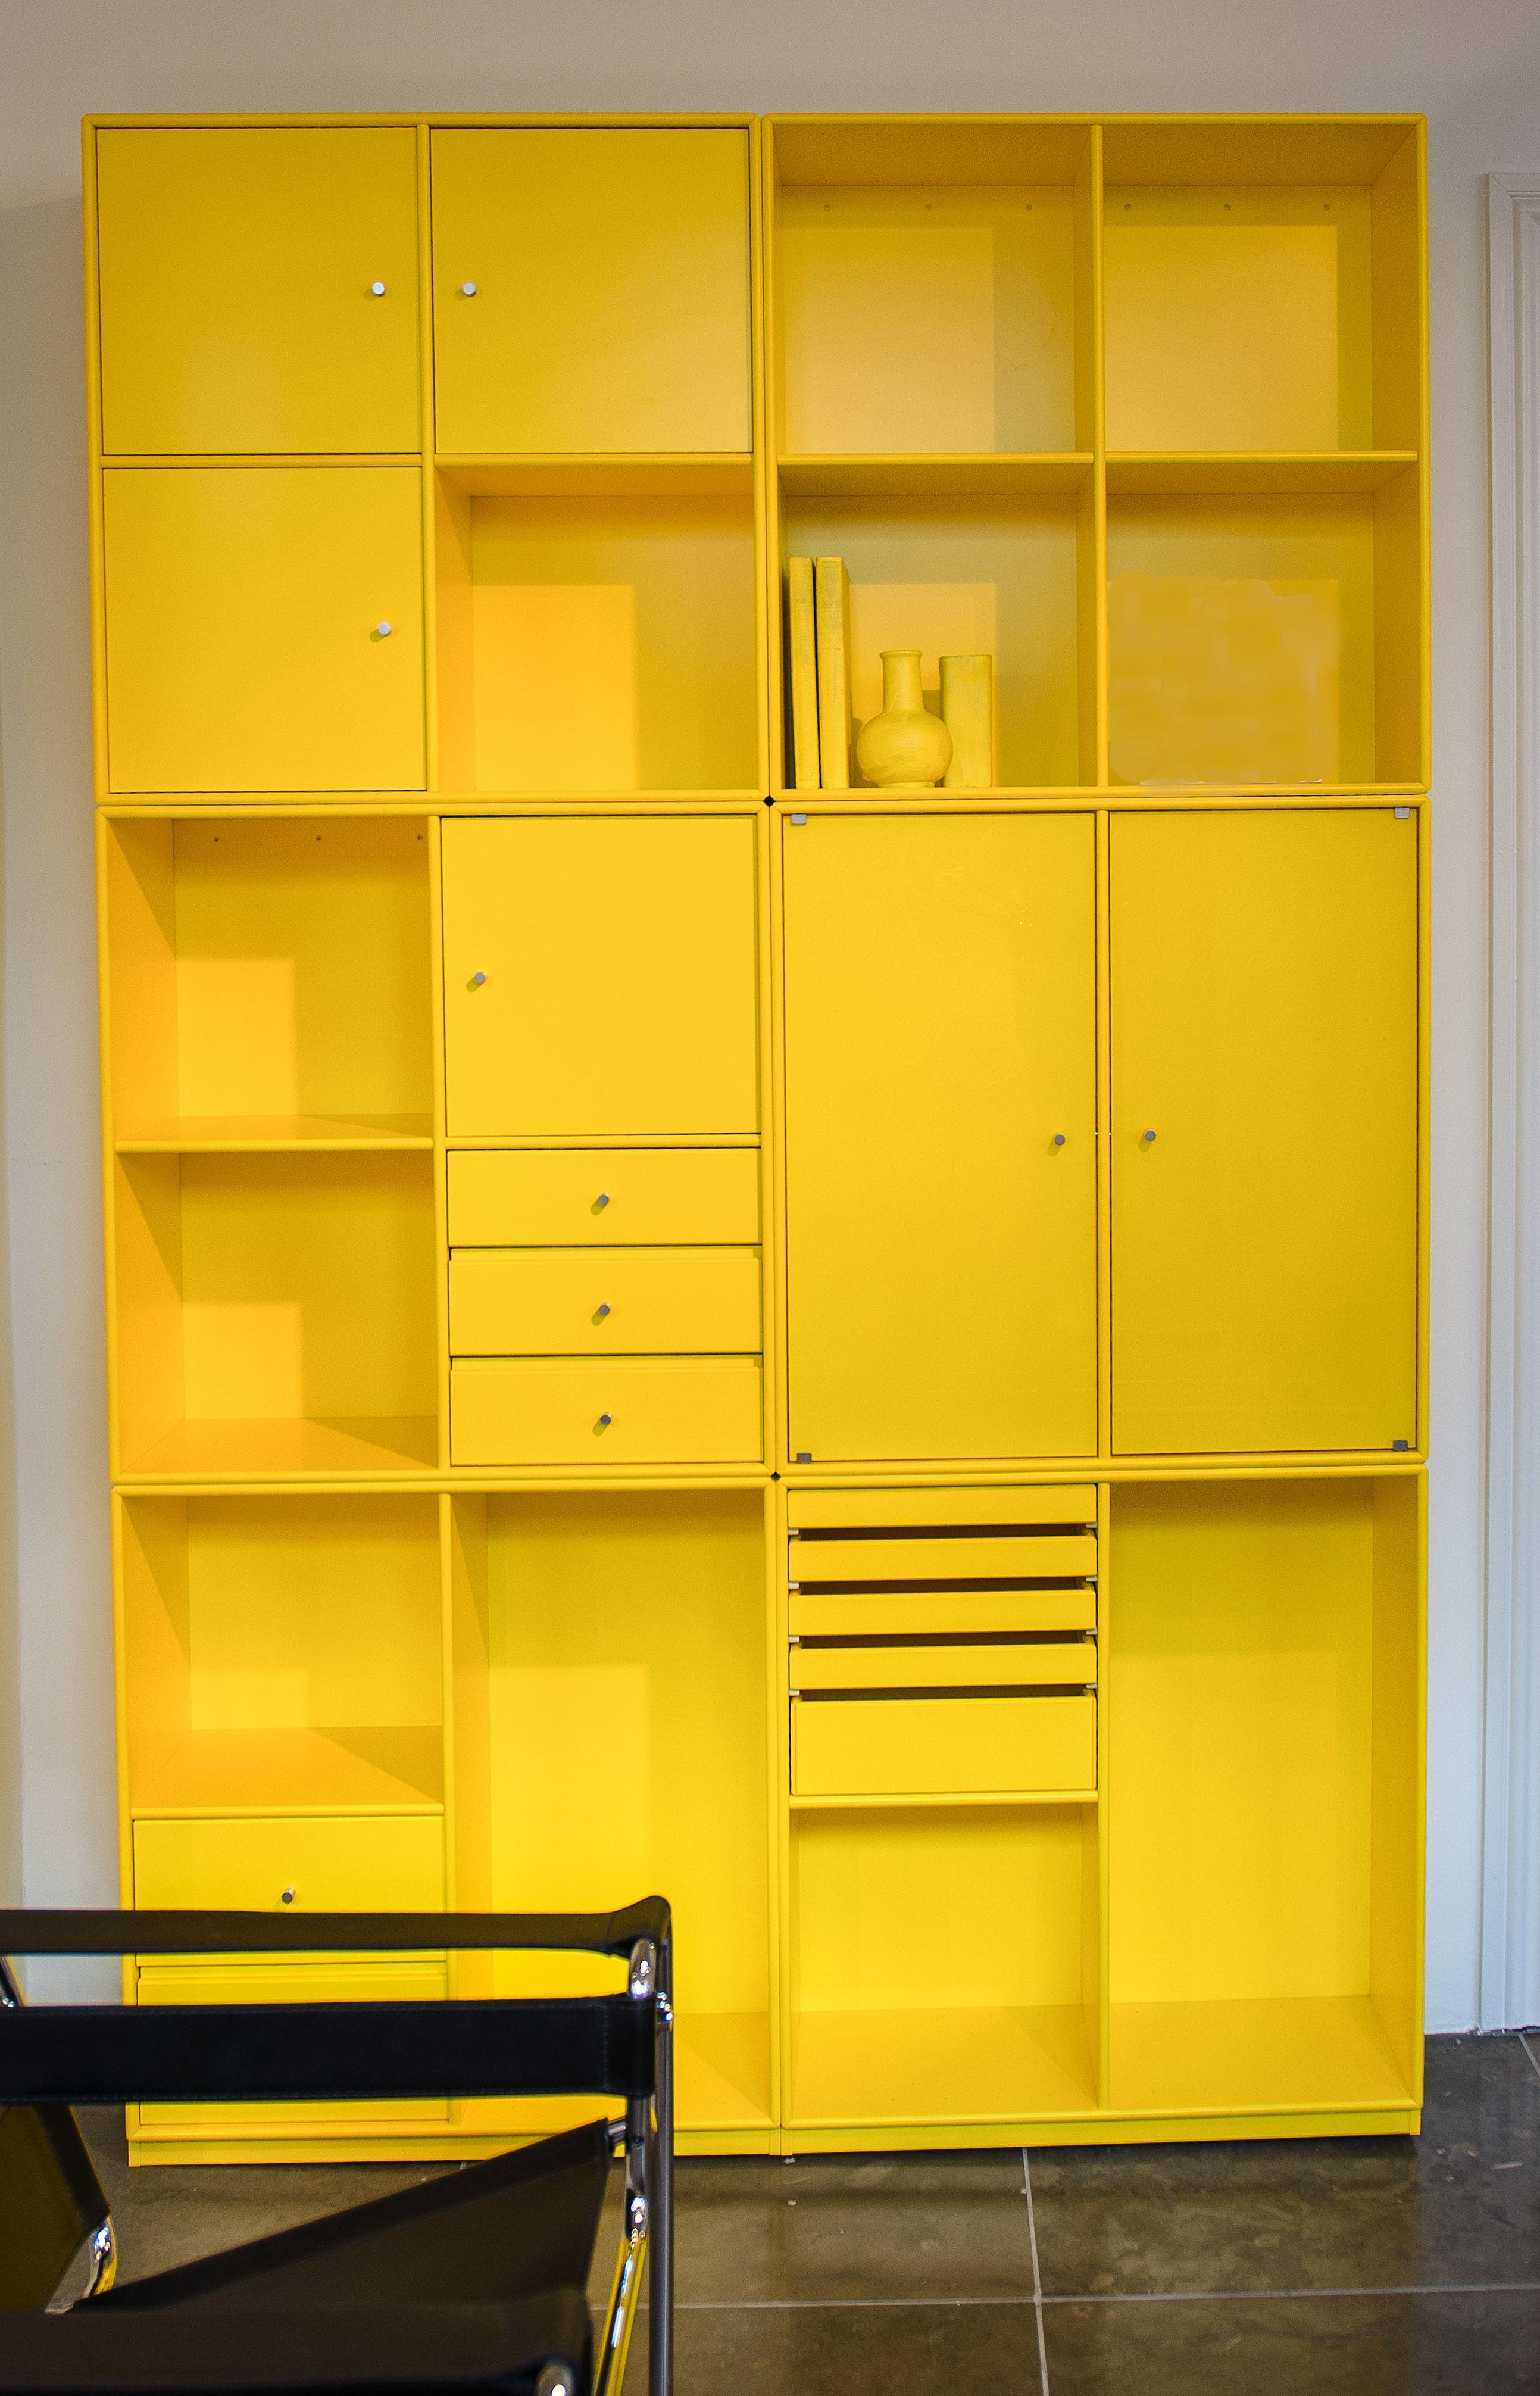 Alternative Colorful Storage By Montanadk Looks Like Something